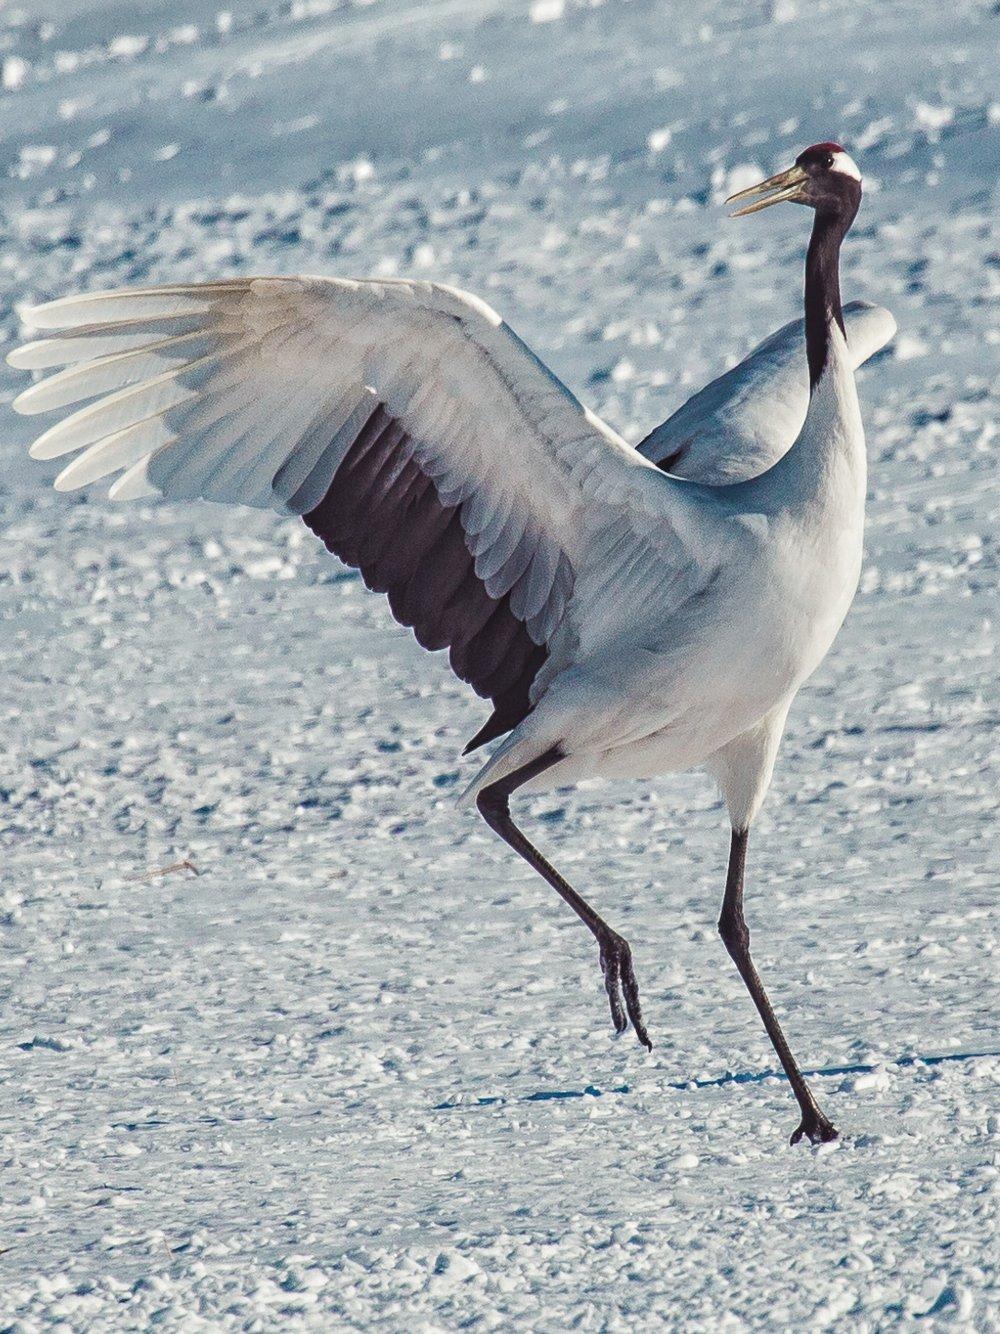 Red Crowned Crane Birds in Tsurui-Mura